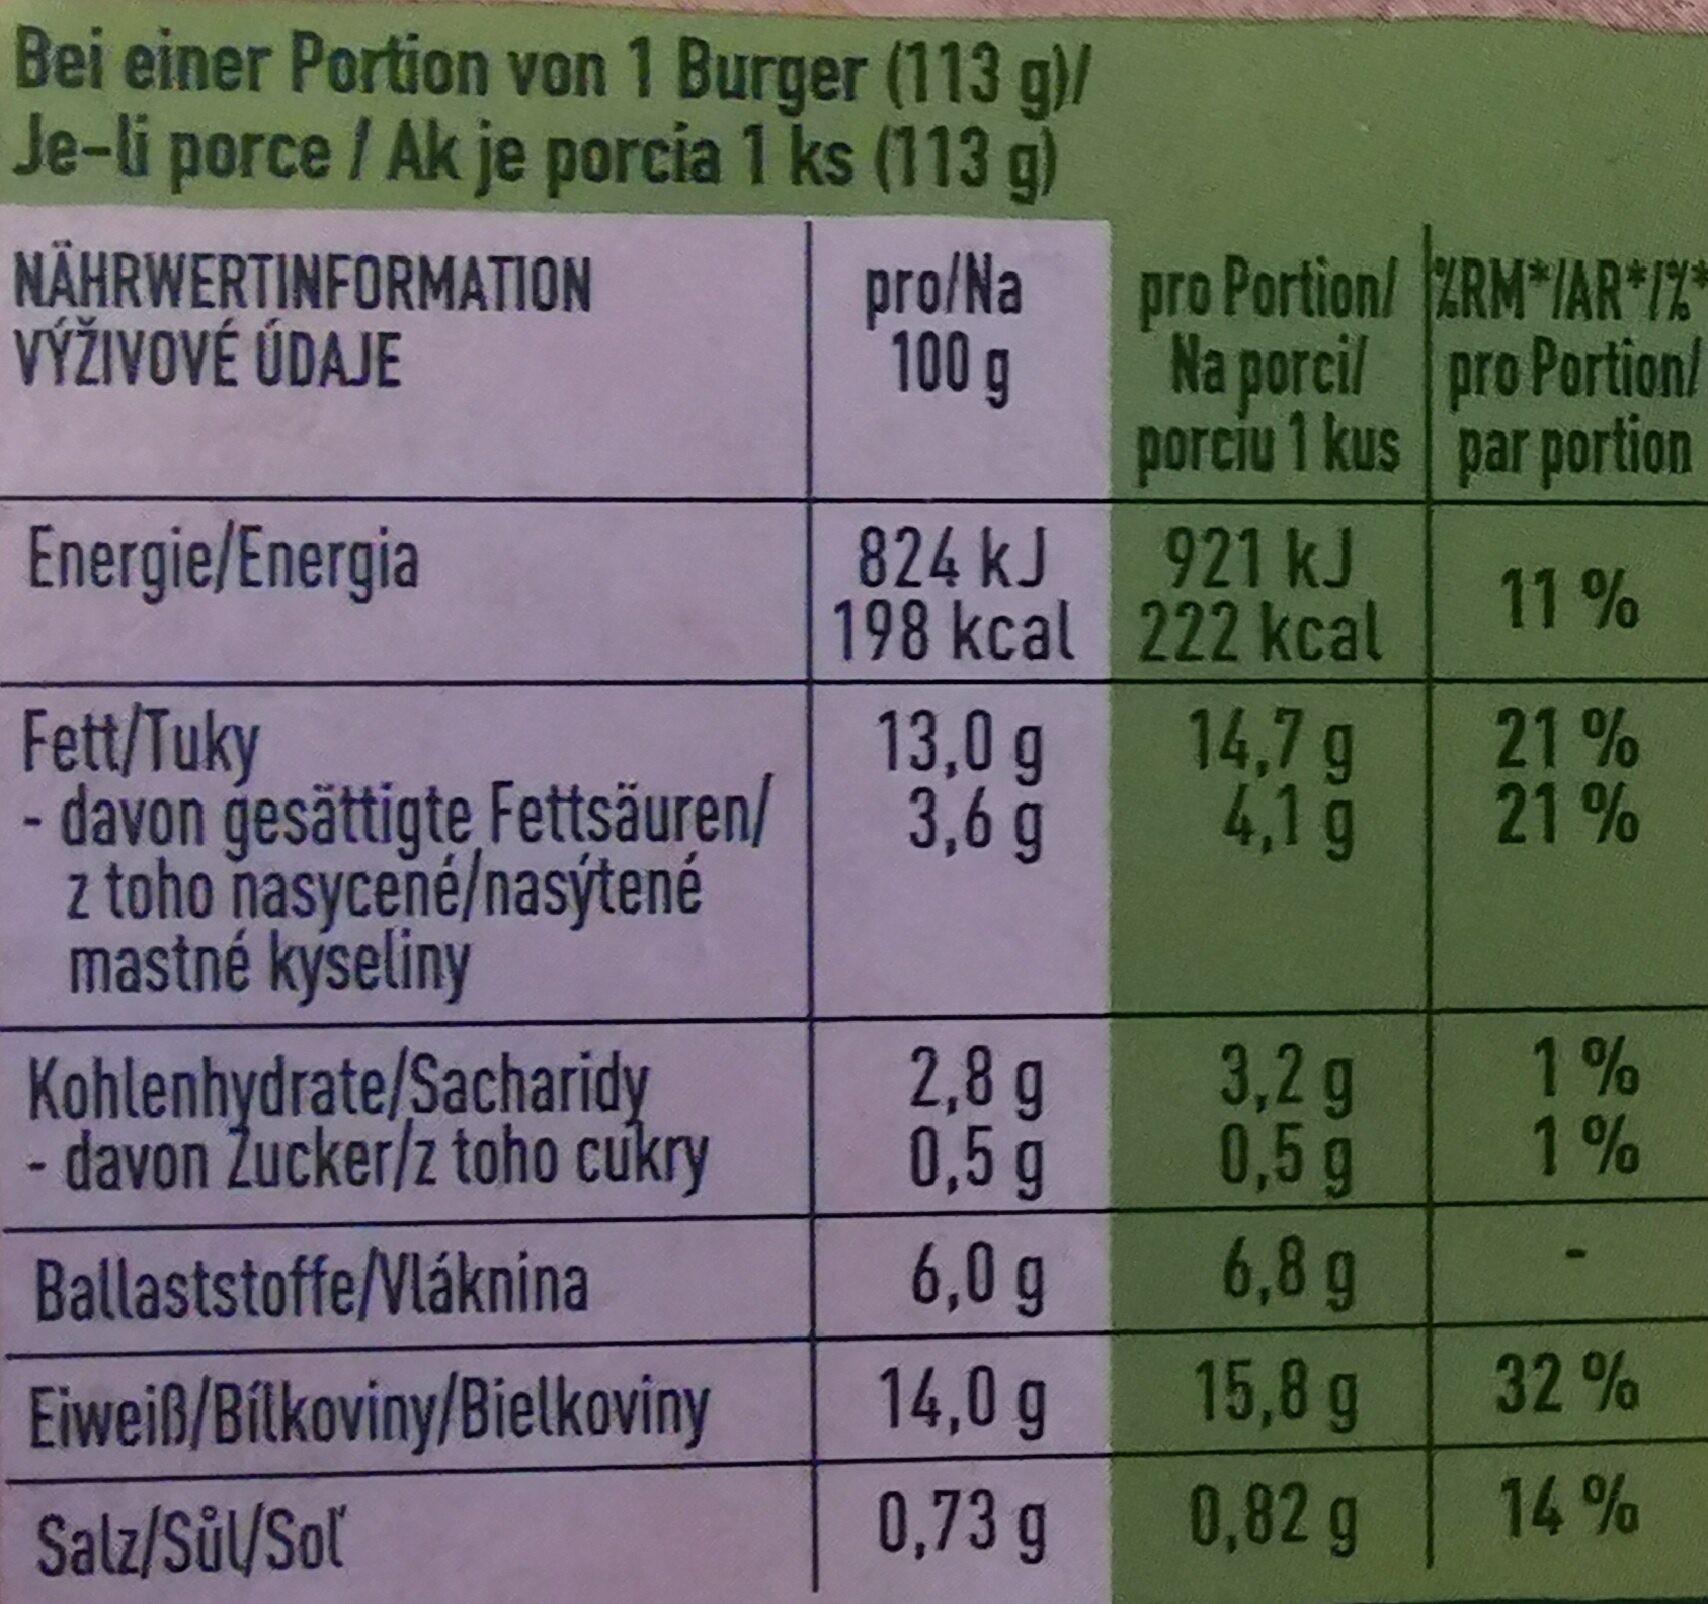 Sensational Burger aus Sojaprotein, roh - Informazioni nutrizionali - de